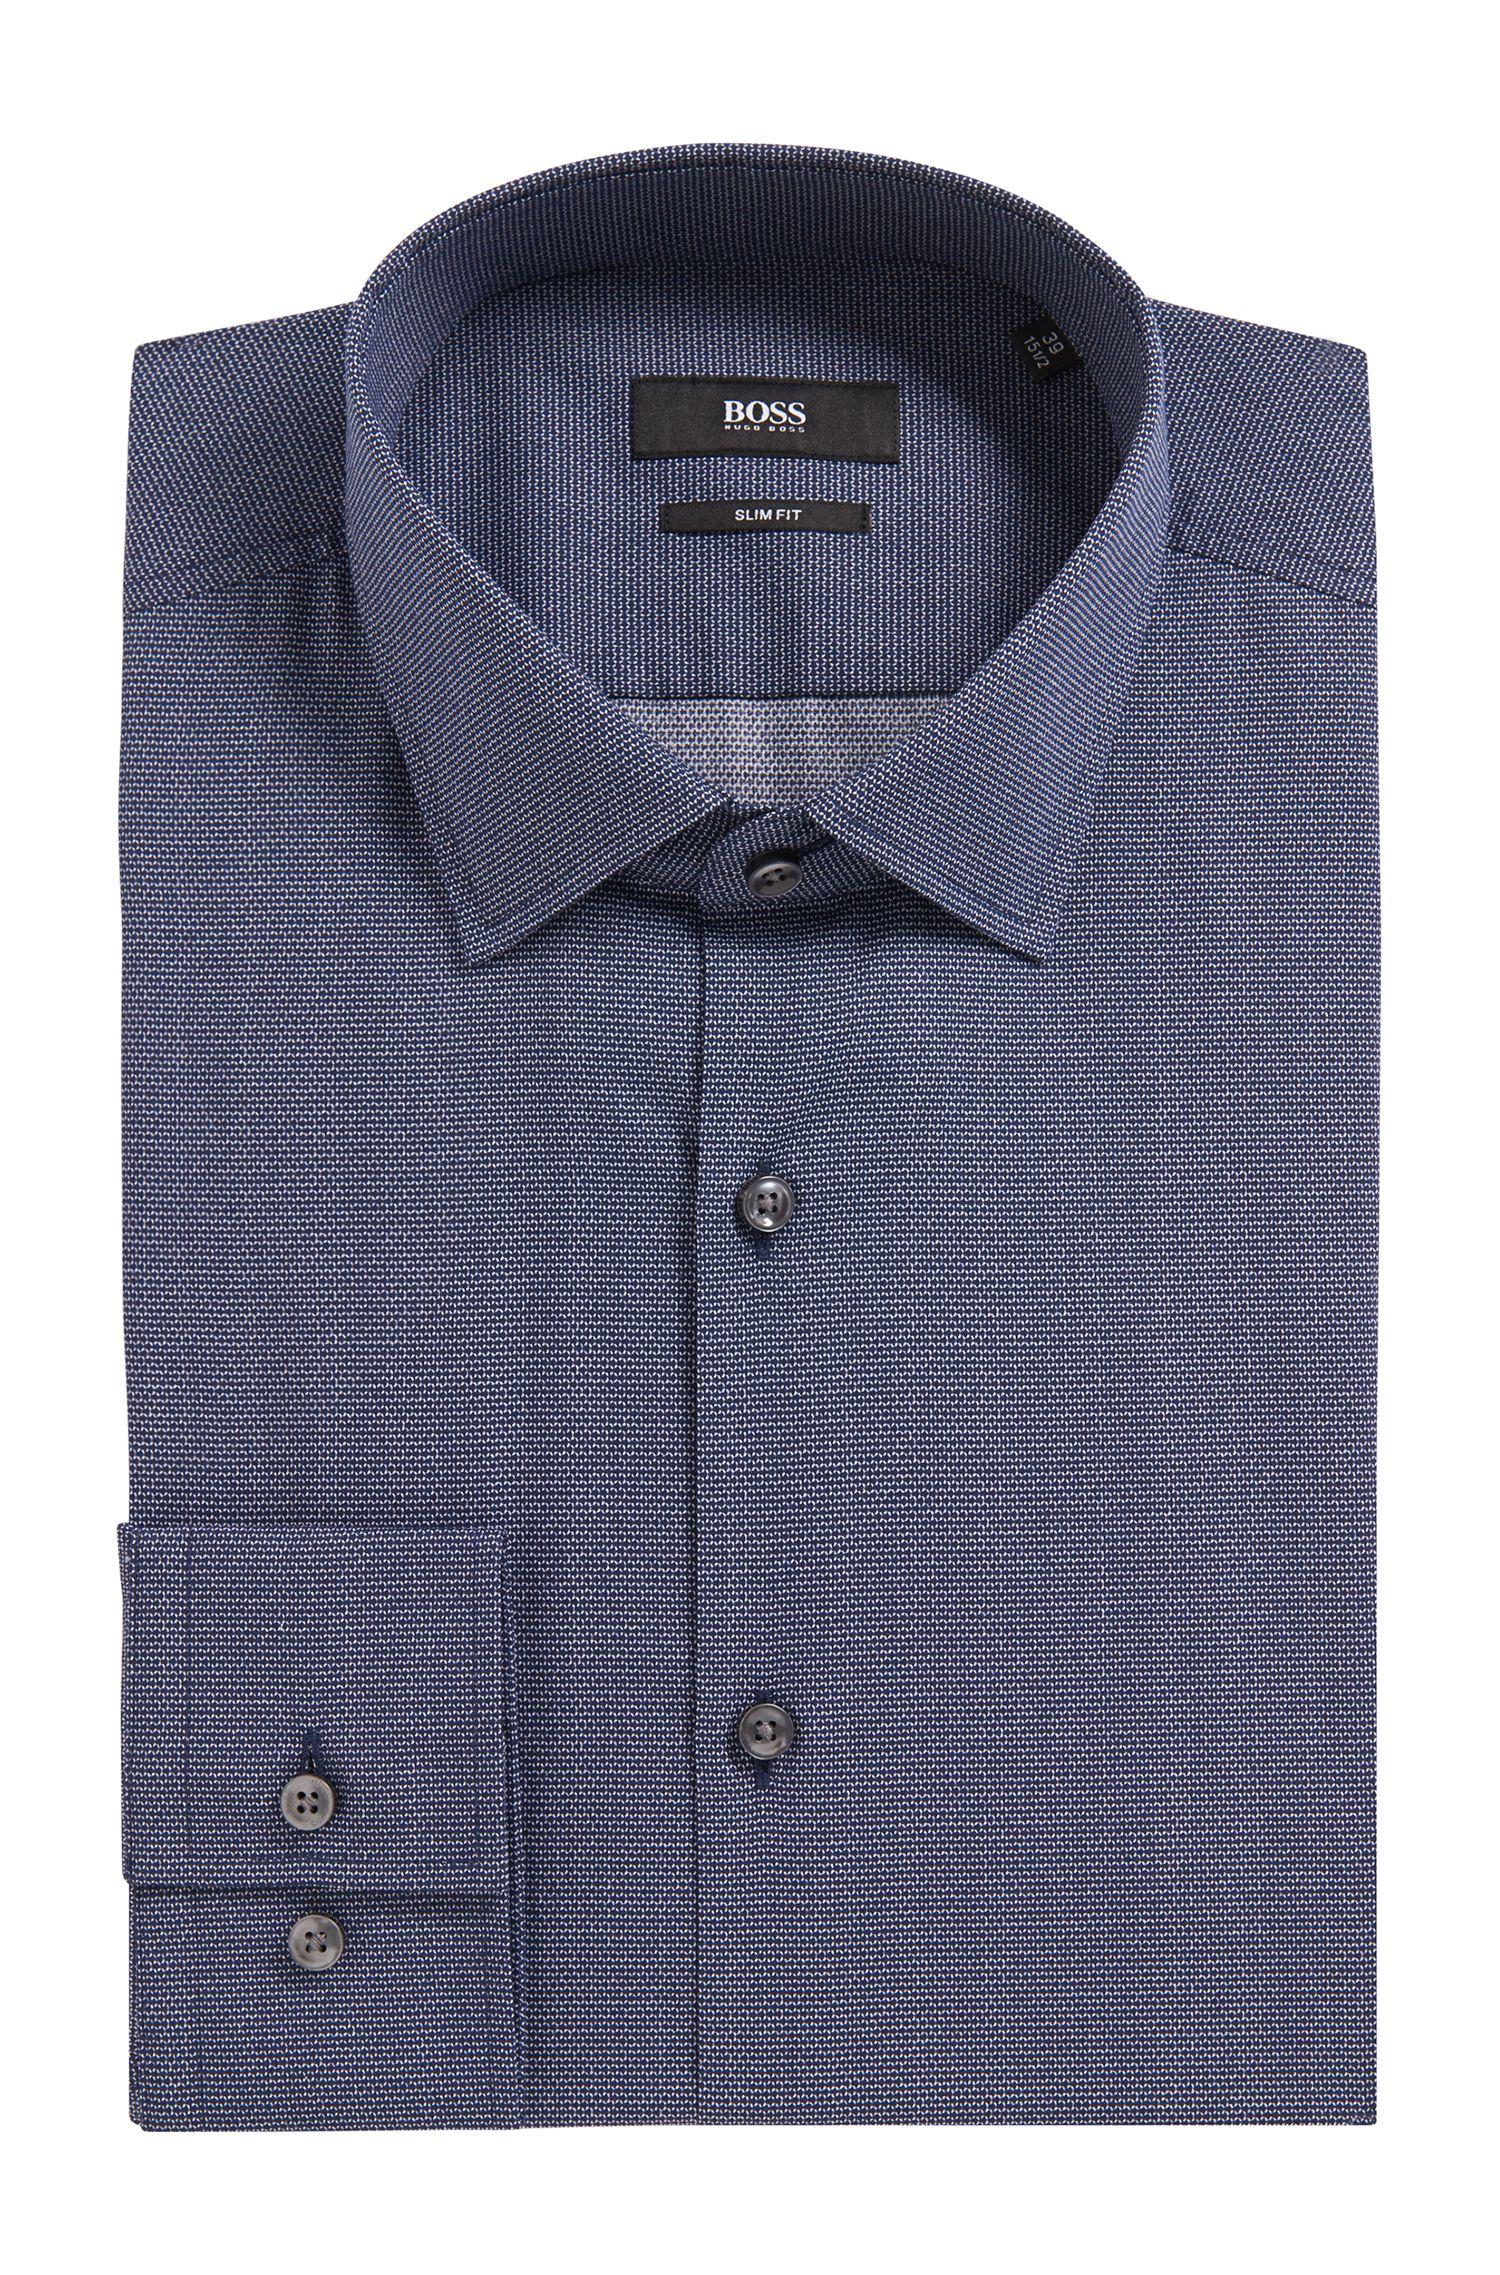 'Jenno'   Slim Fit, Italian Cotton Dress Shirt